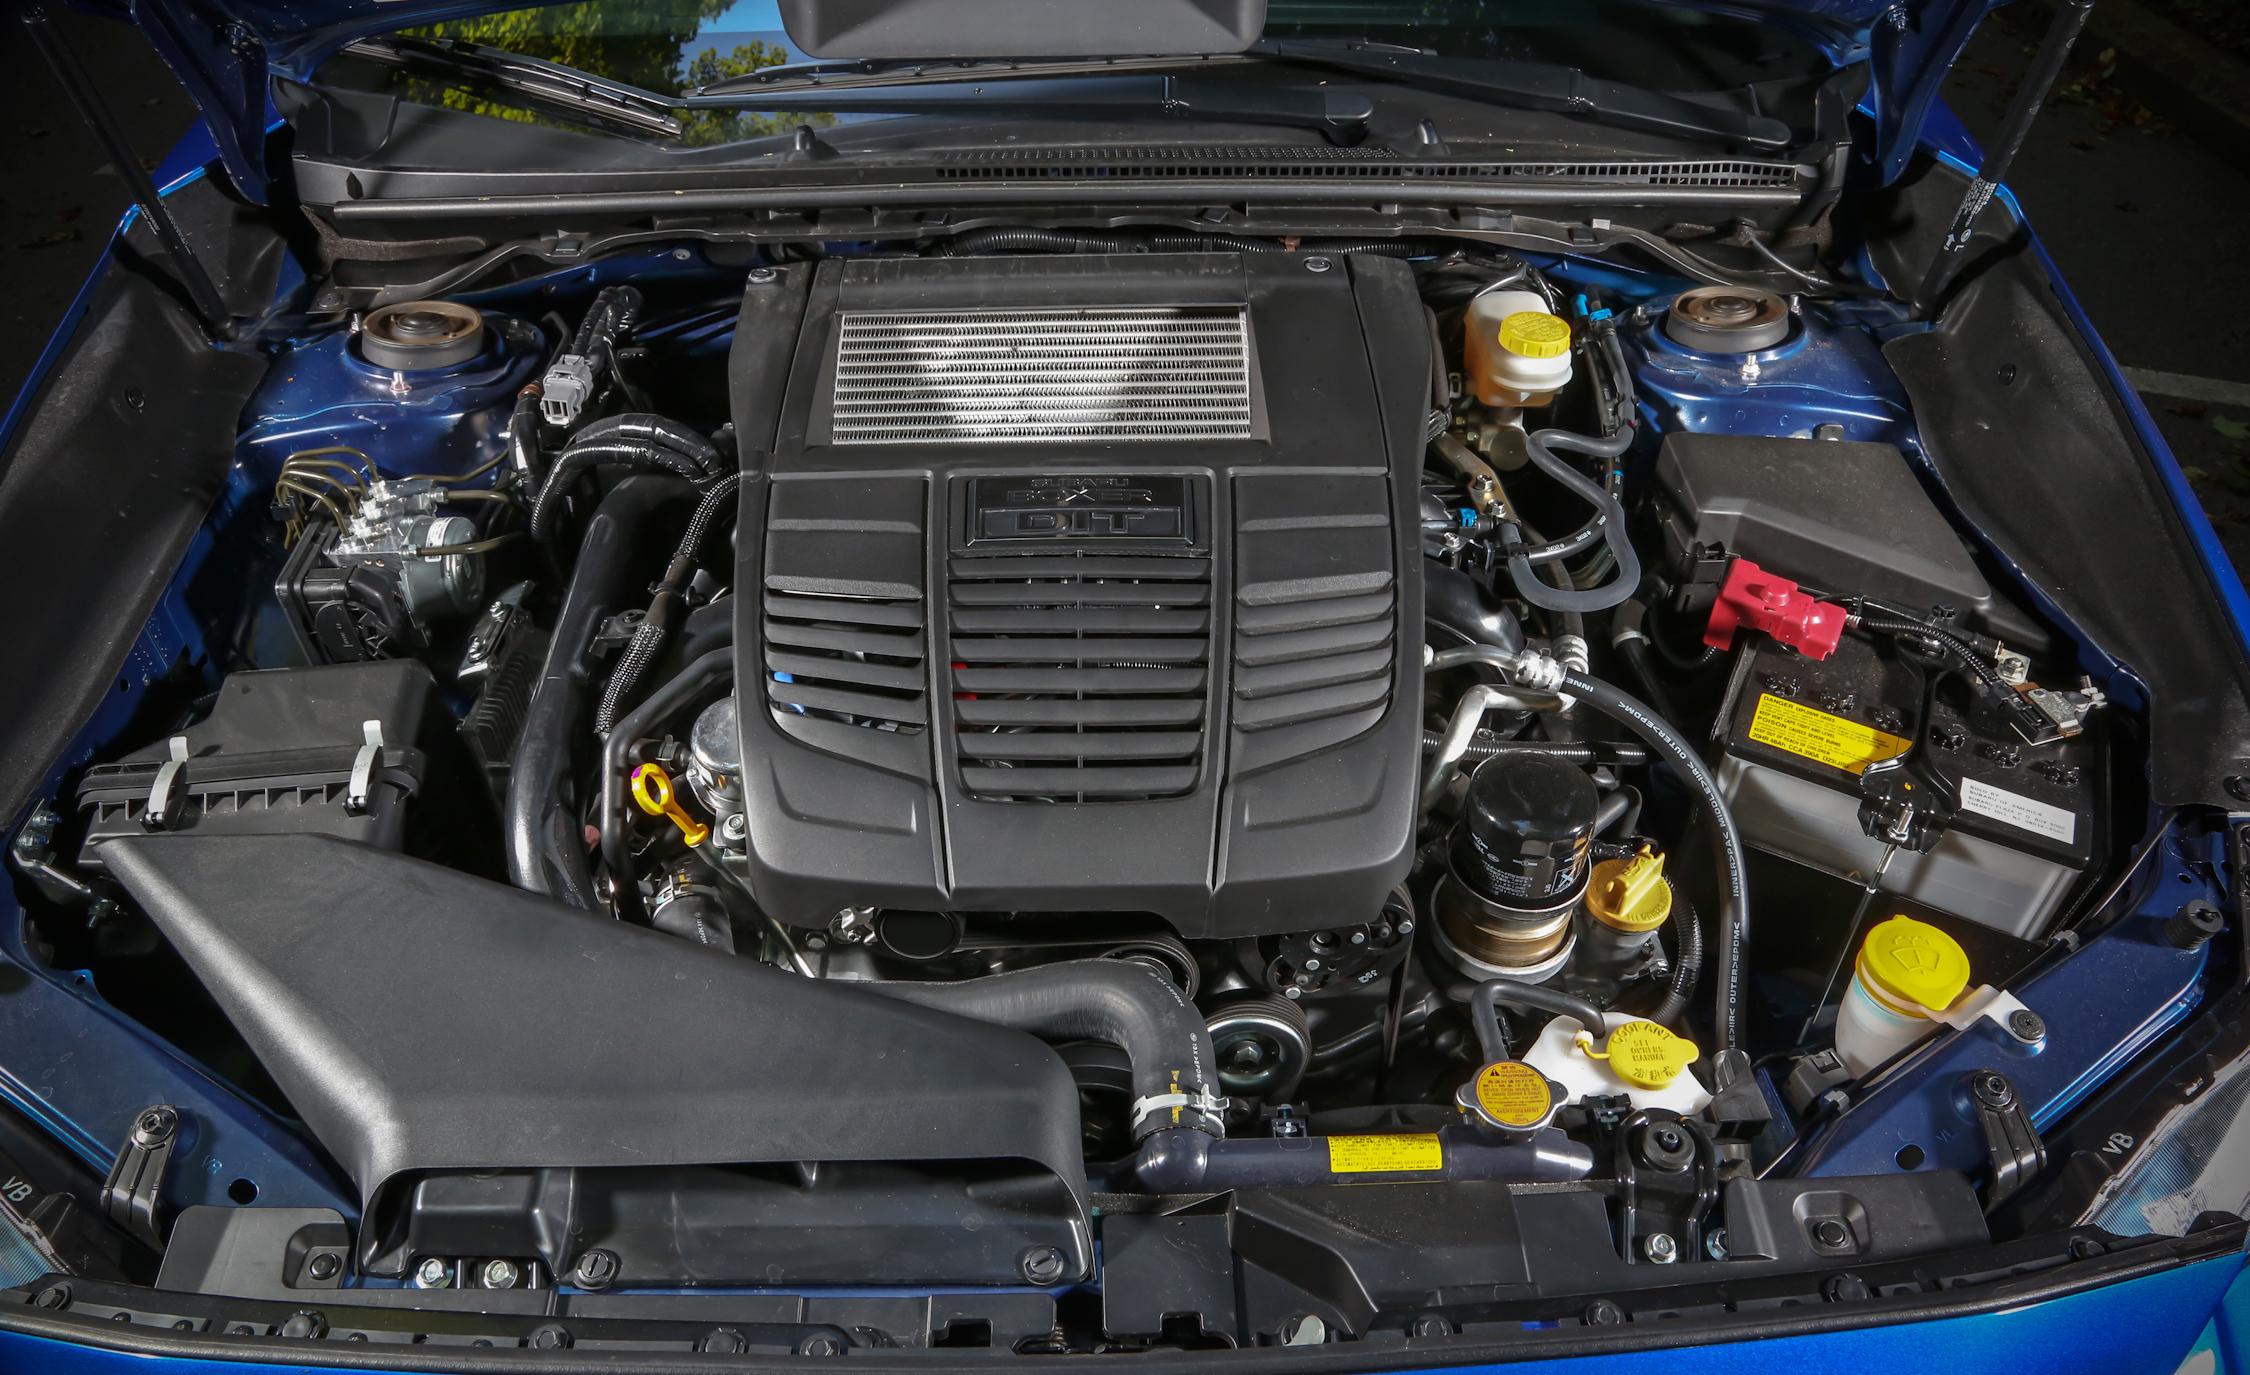 2015 subaru wrx turbocharged 2 0 liter flat 4 engine 6472 cars performance reviews and test. Black Bedroom Furniture Sets. Home Design Ideas